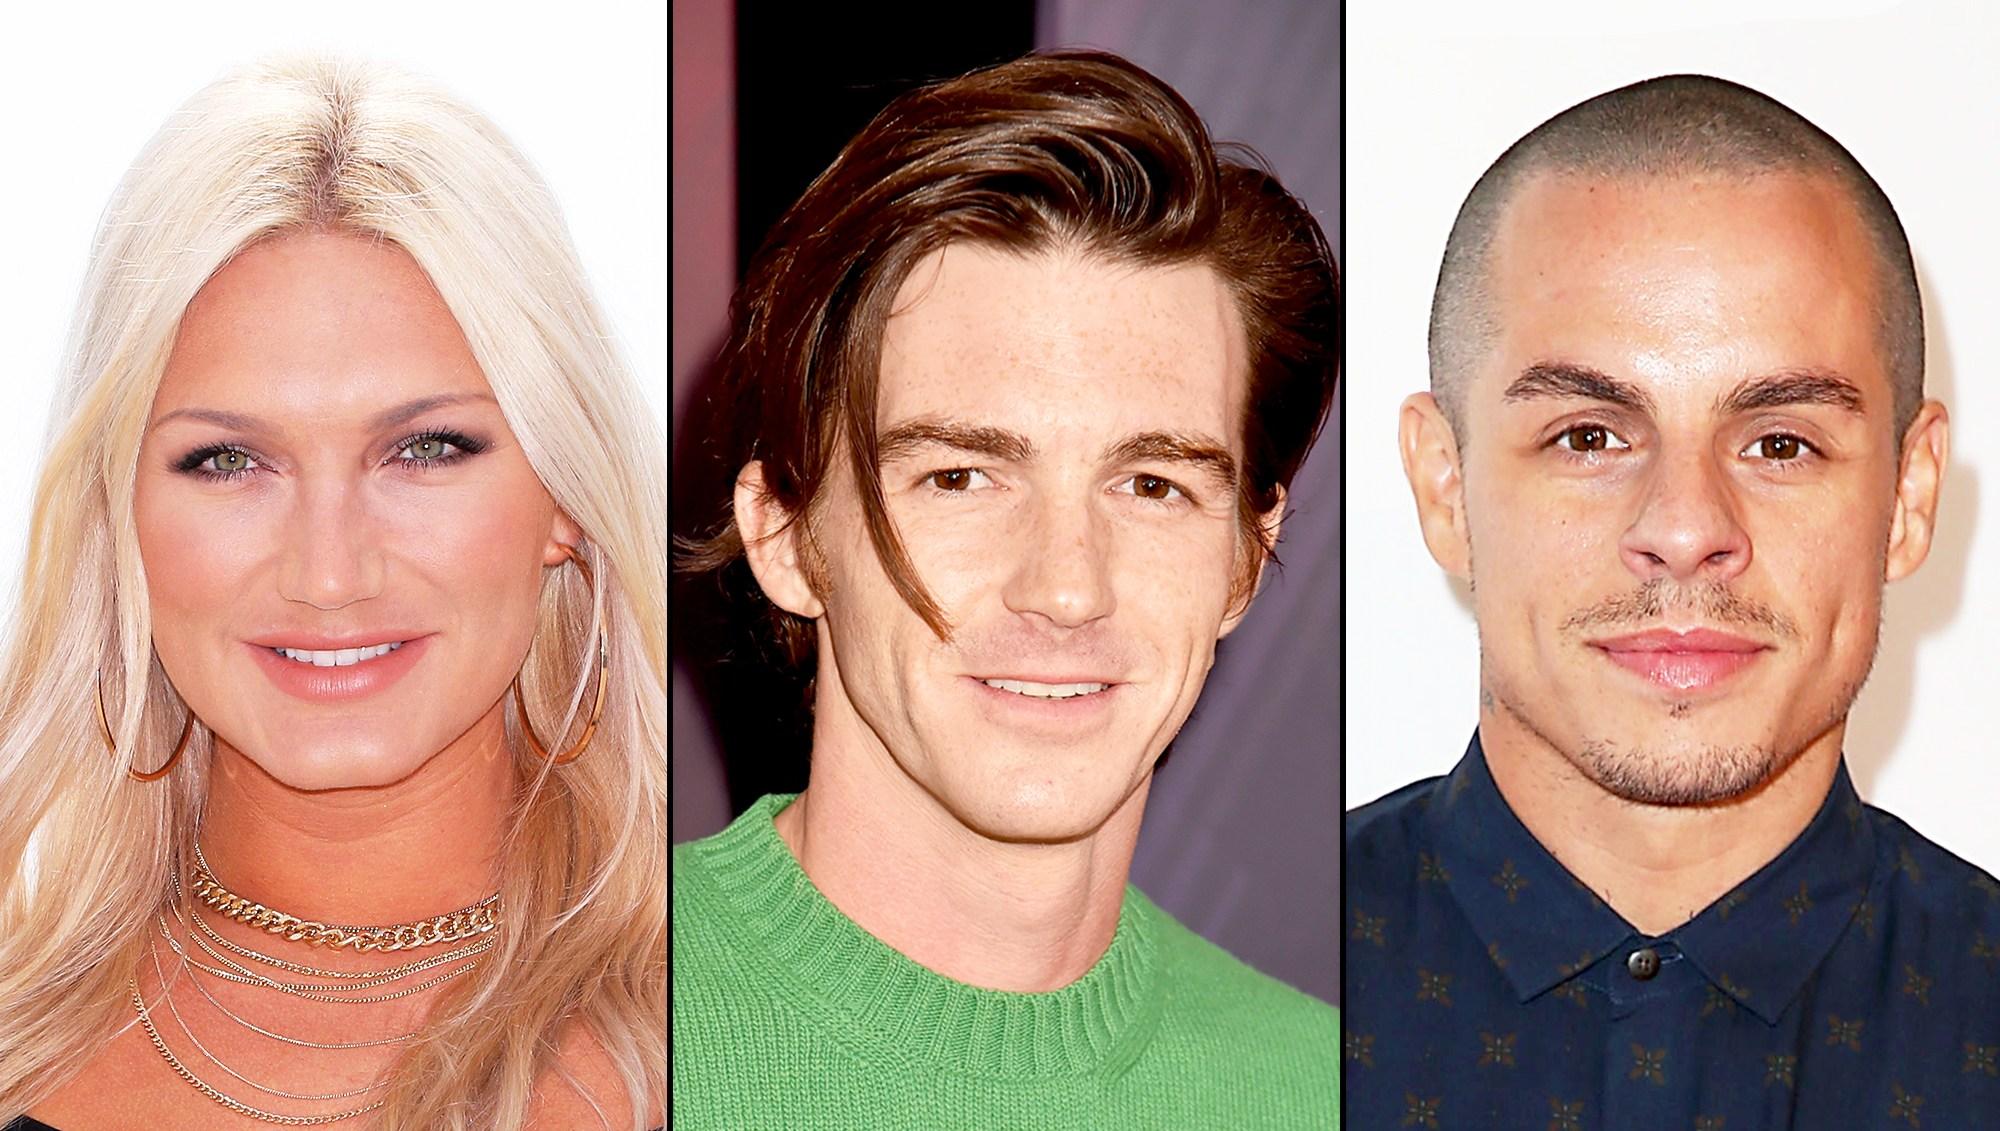 Brooke Hogan, Drake Bell and Casper Smart